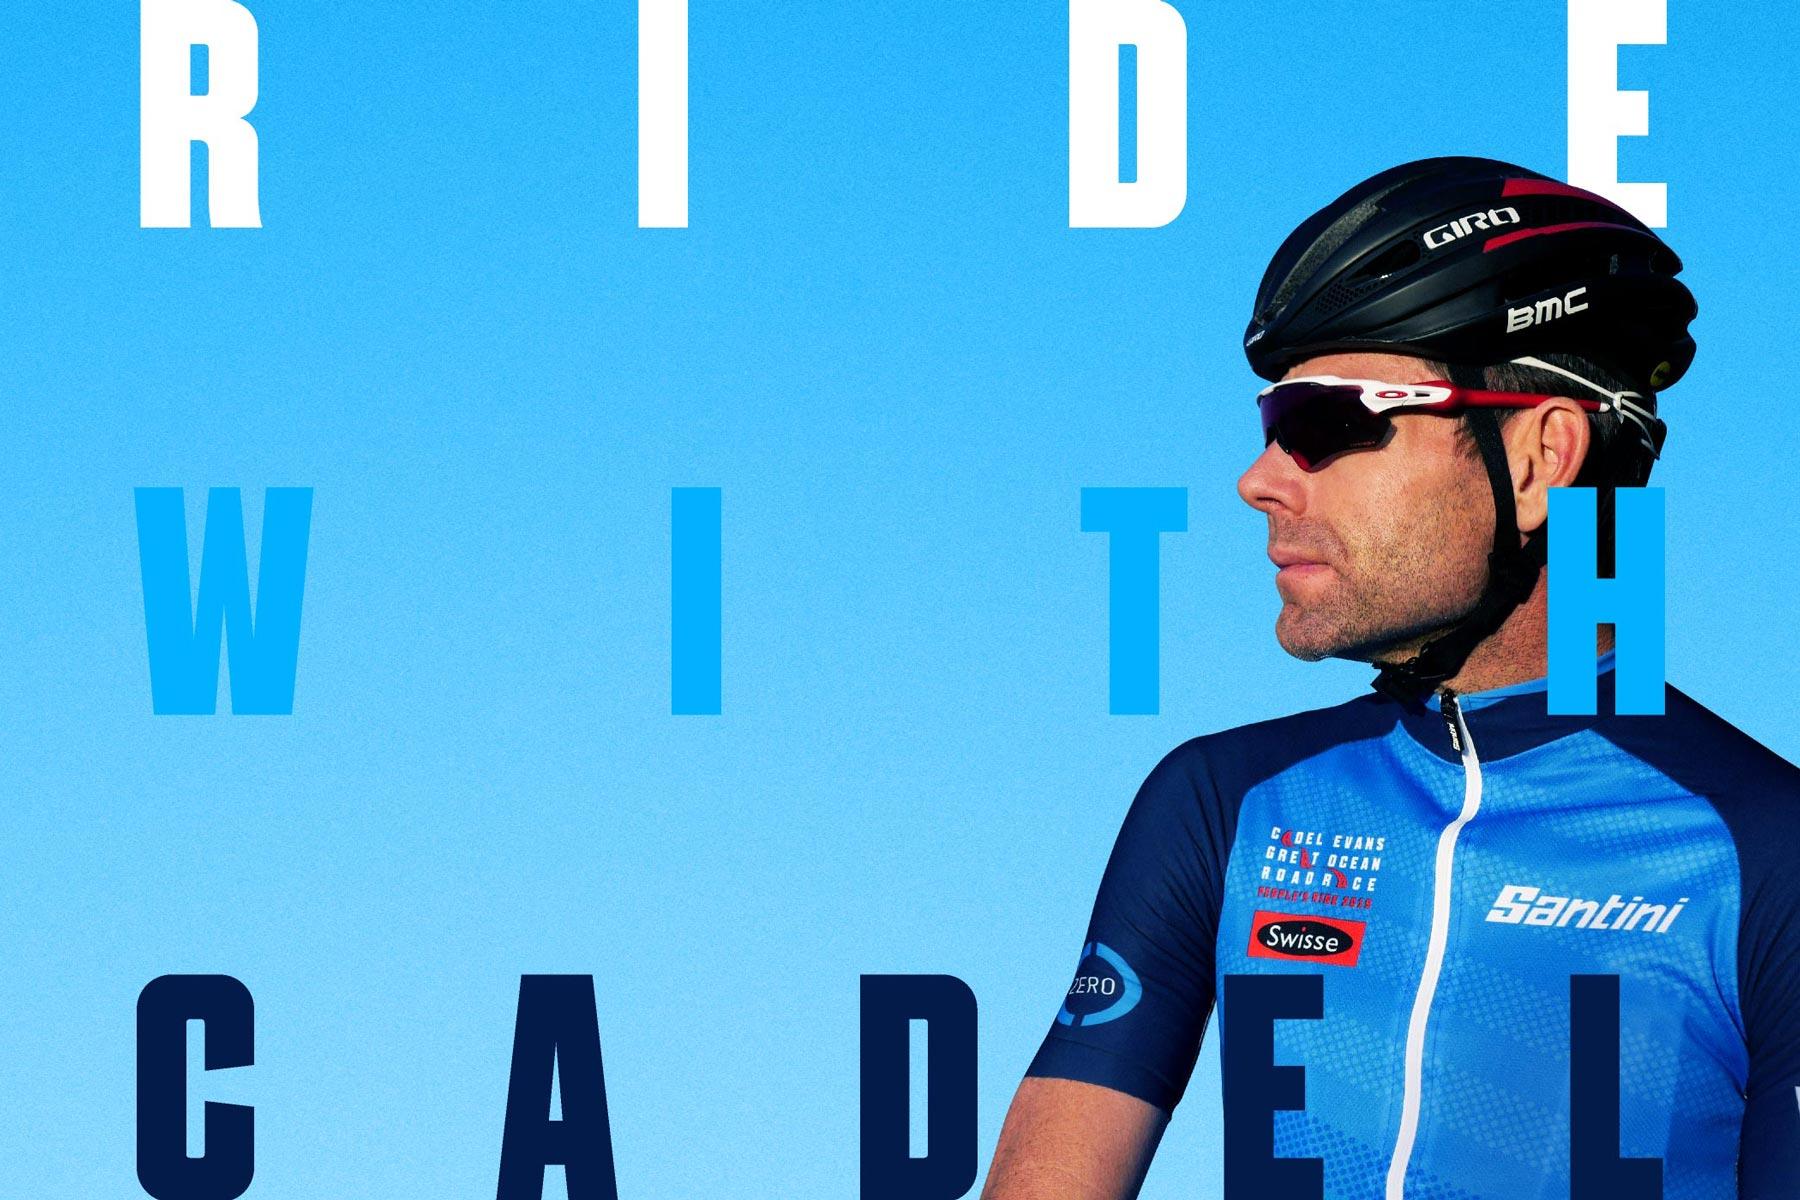 156afe4e8 Overview - Cadel Evans Great Ocean Road Race